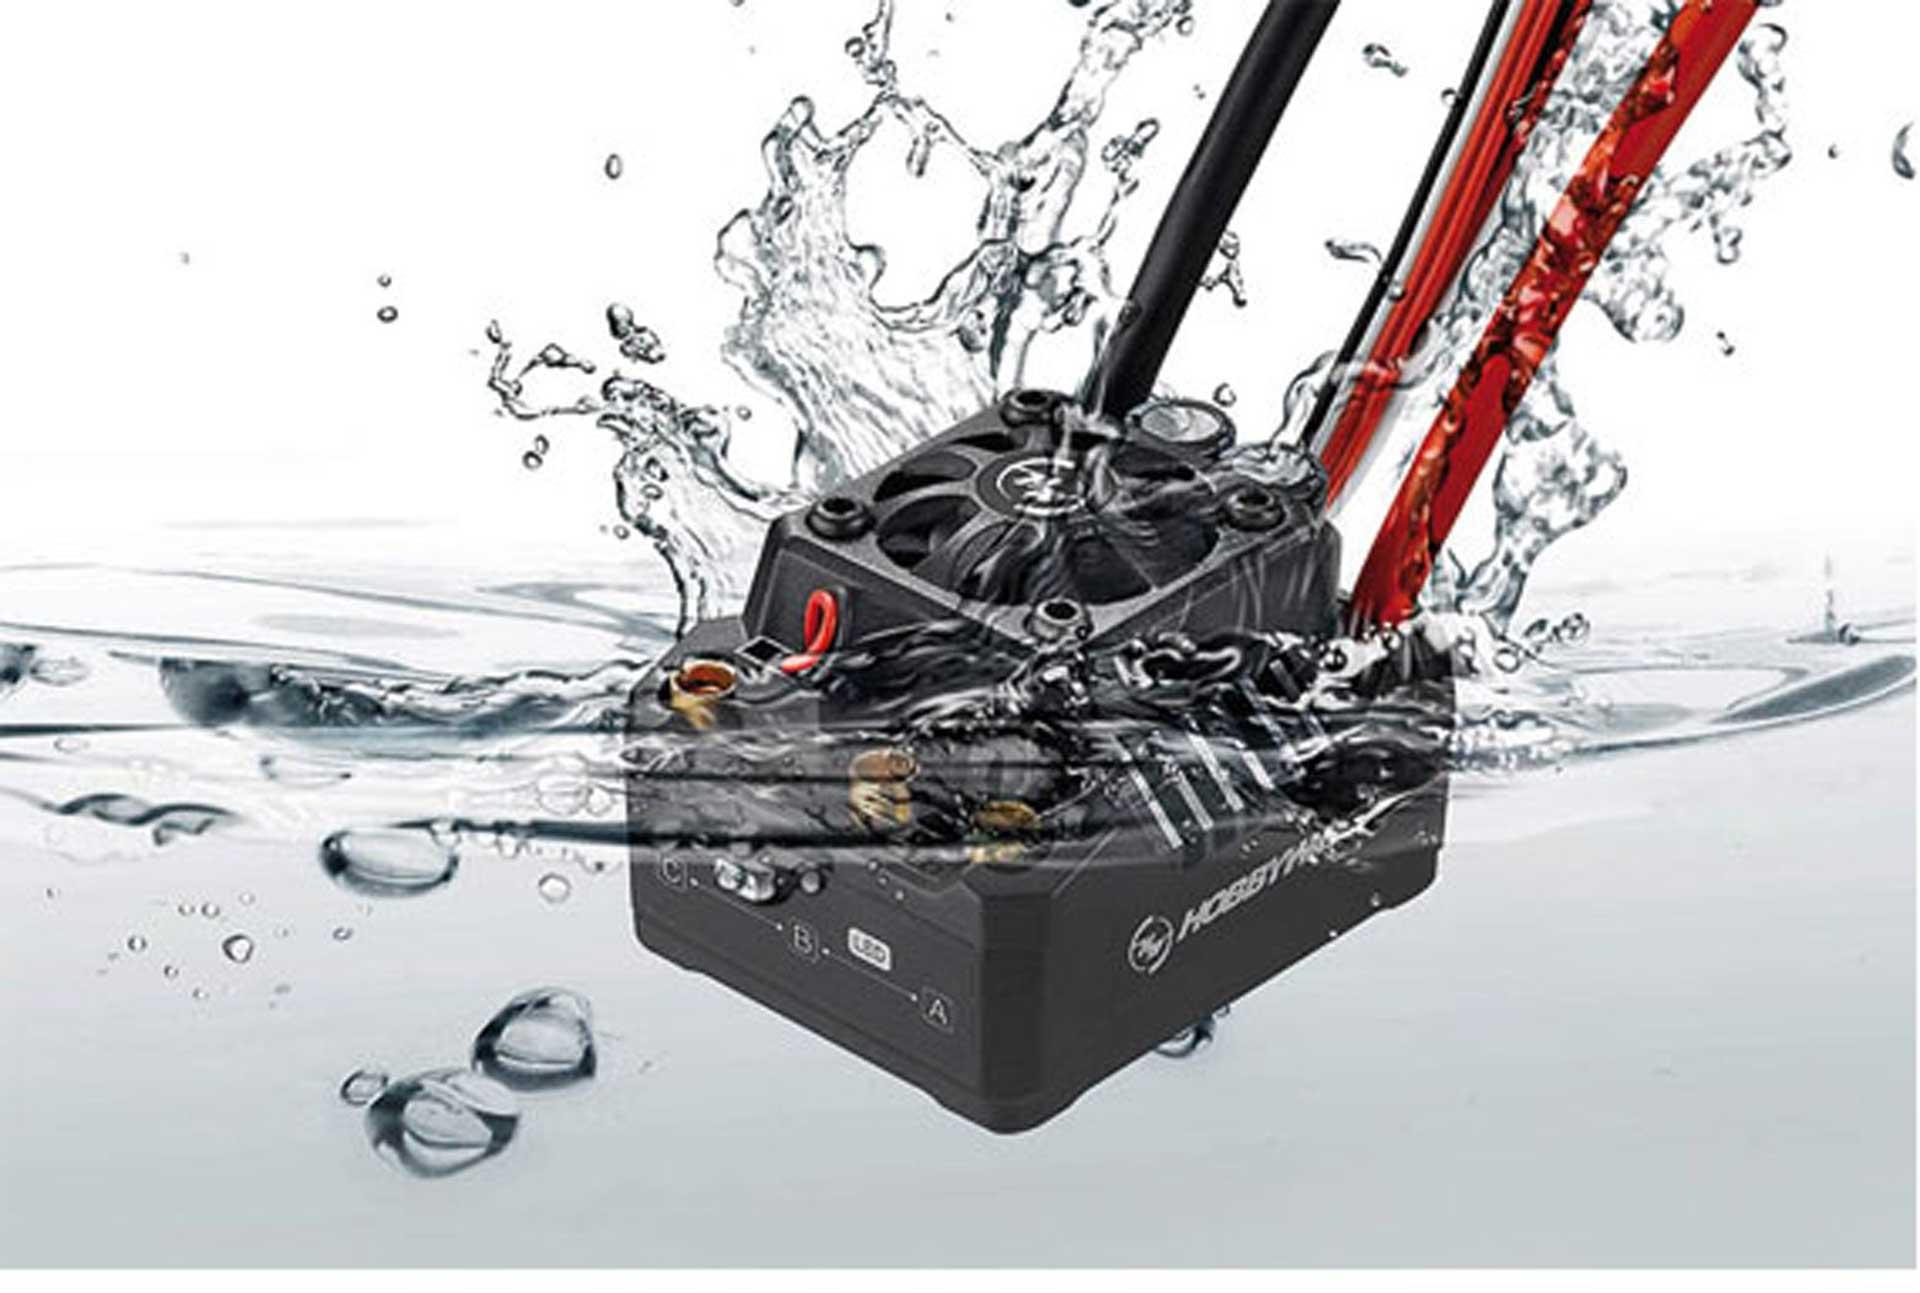 HOBBYWING EZRUN ESC MAX10-SCT 120A B EC 4A 2-4S WATERPROOF FOR 1/10